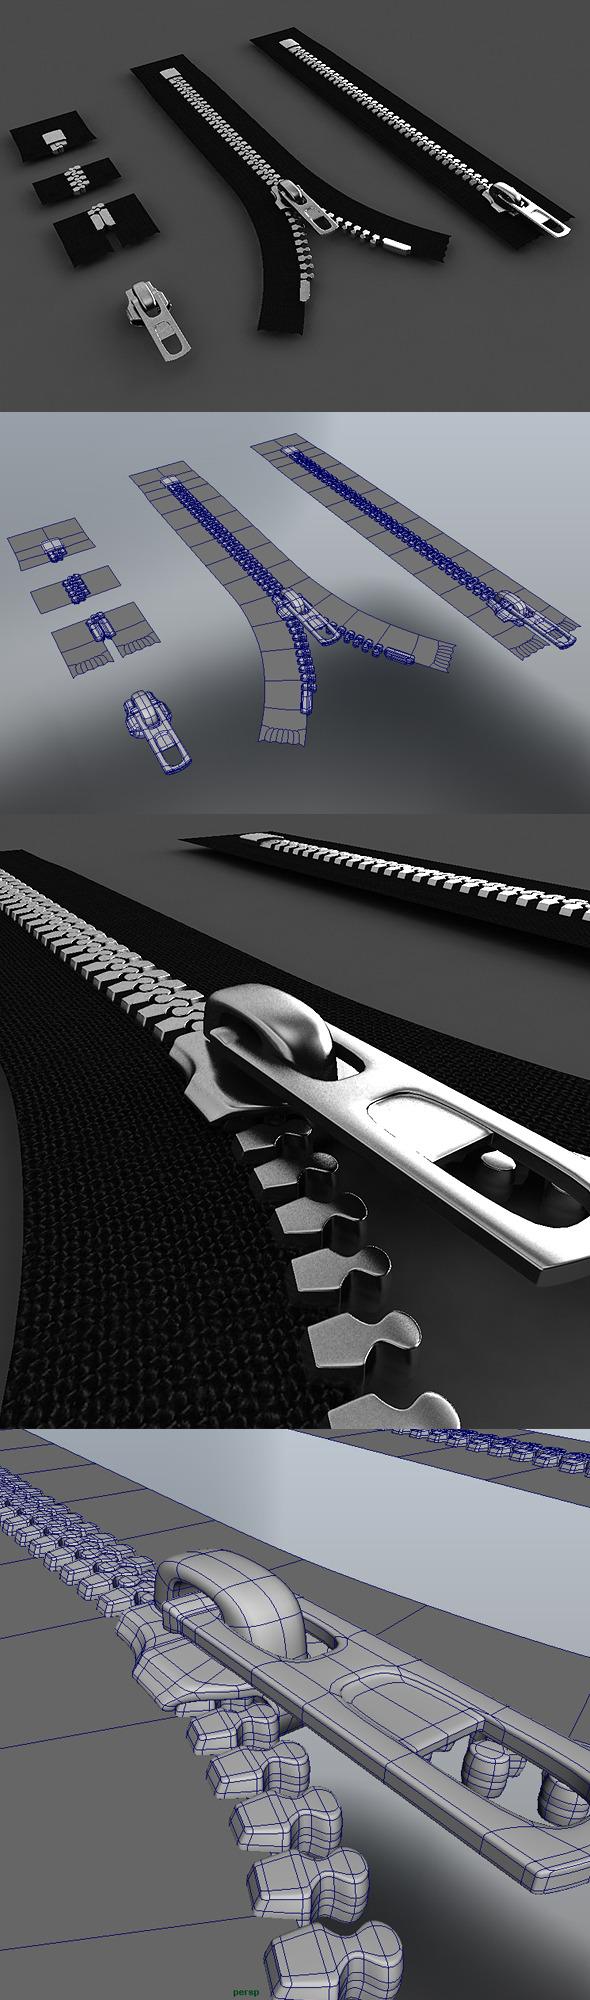 Zipper Construction Kit - 3DOcean Item for Sale